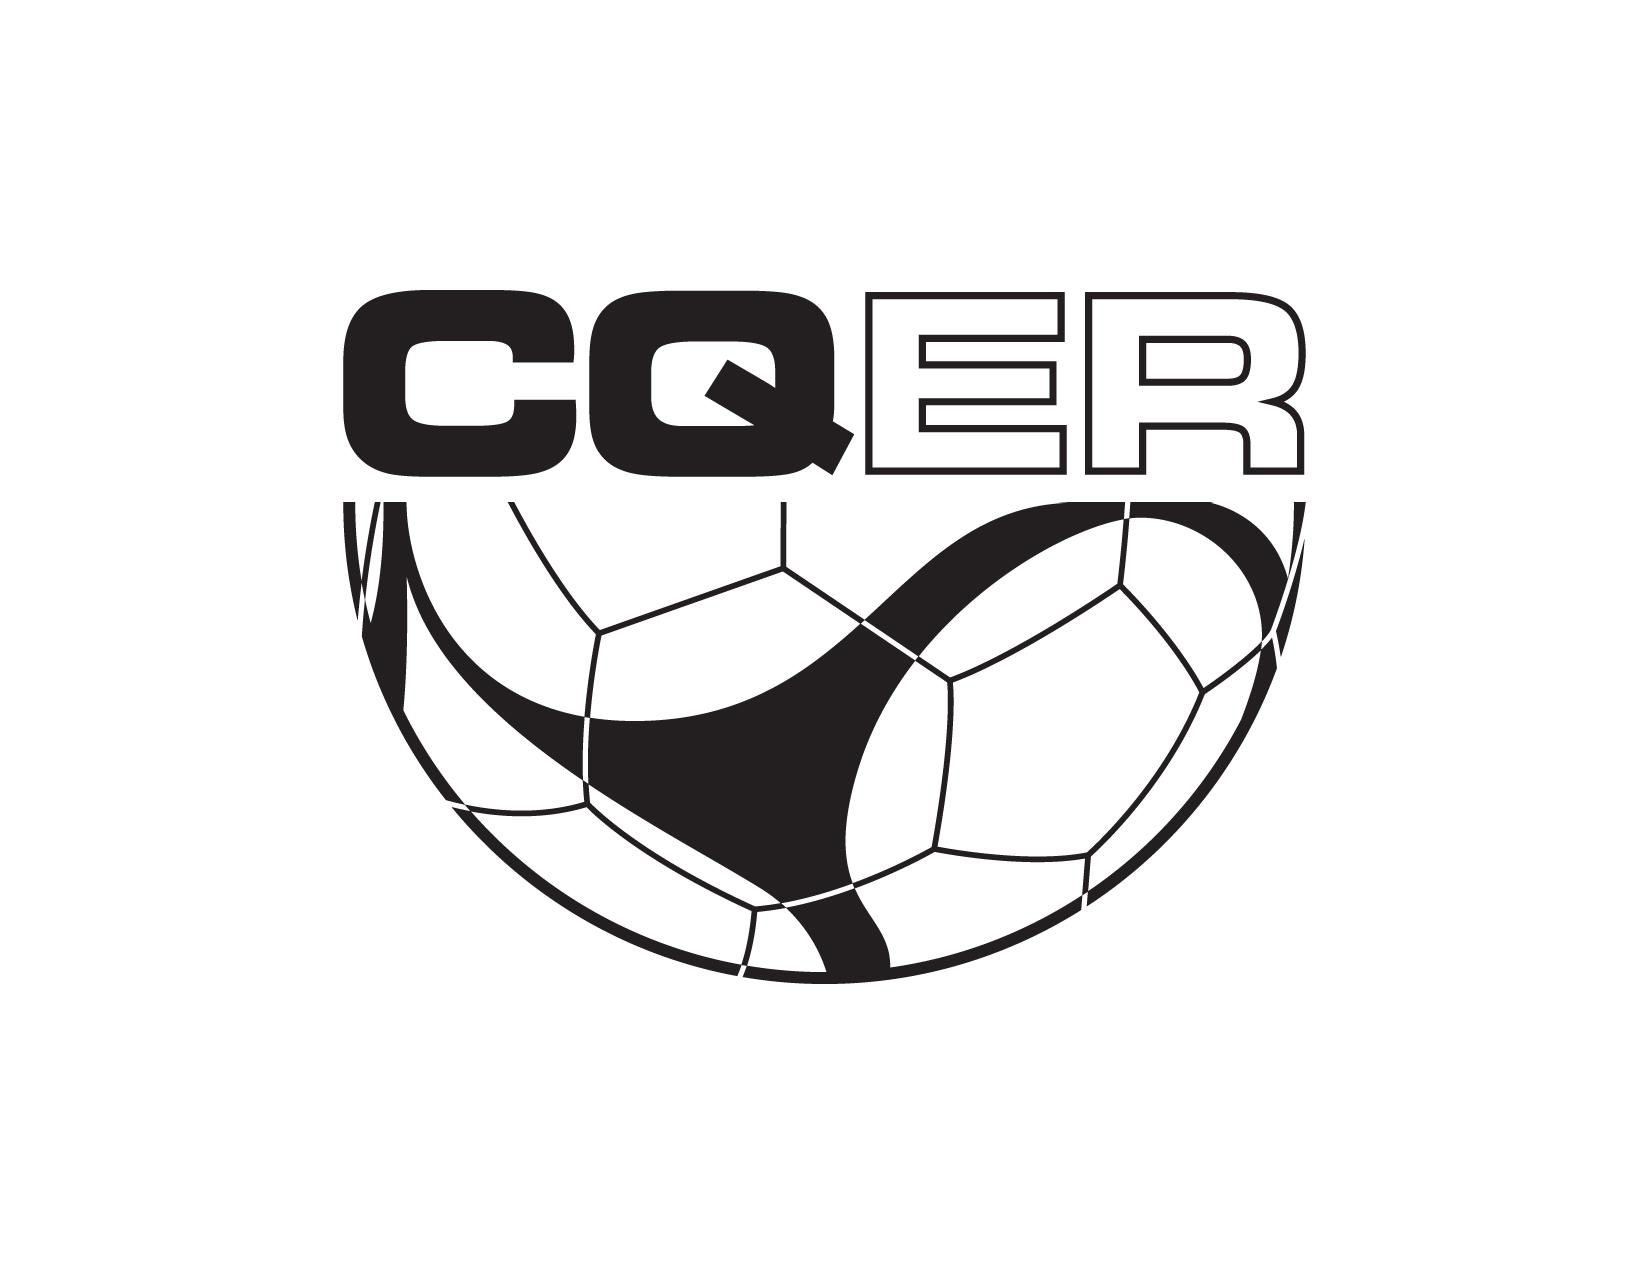 cqer soccer club logo by stepfar watch designs interfaces logos ...